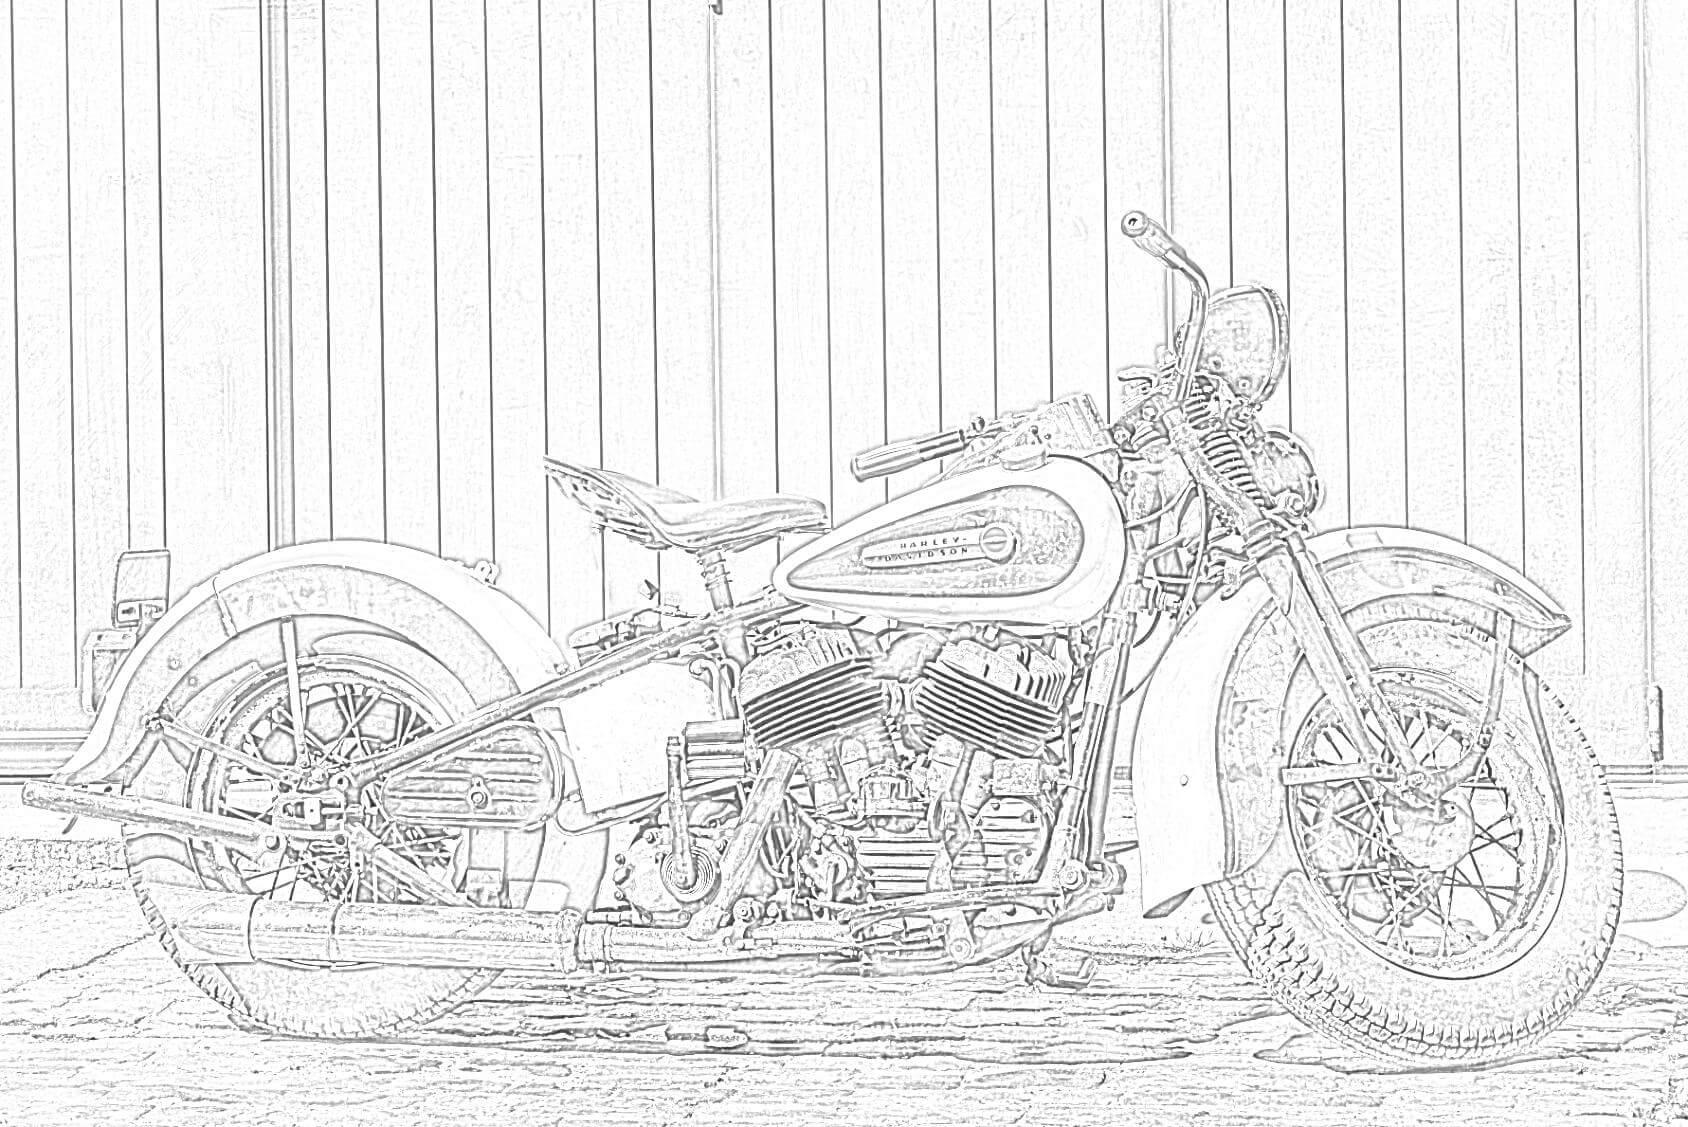 Harley Davidson Vintage Motorcycle Coloring Page